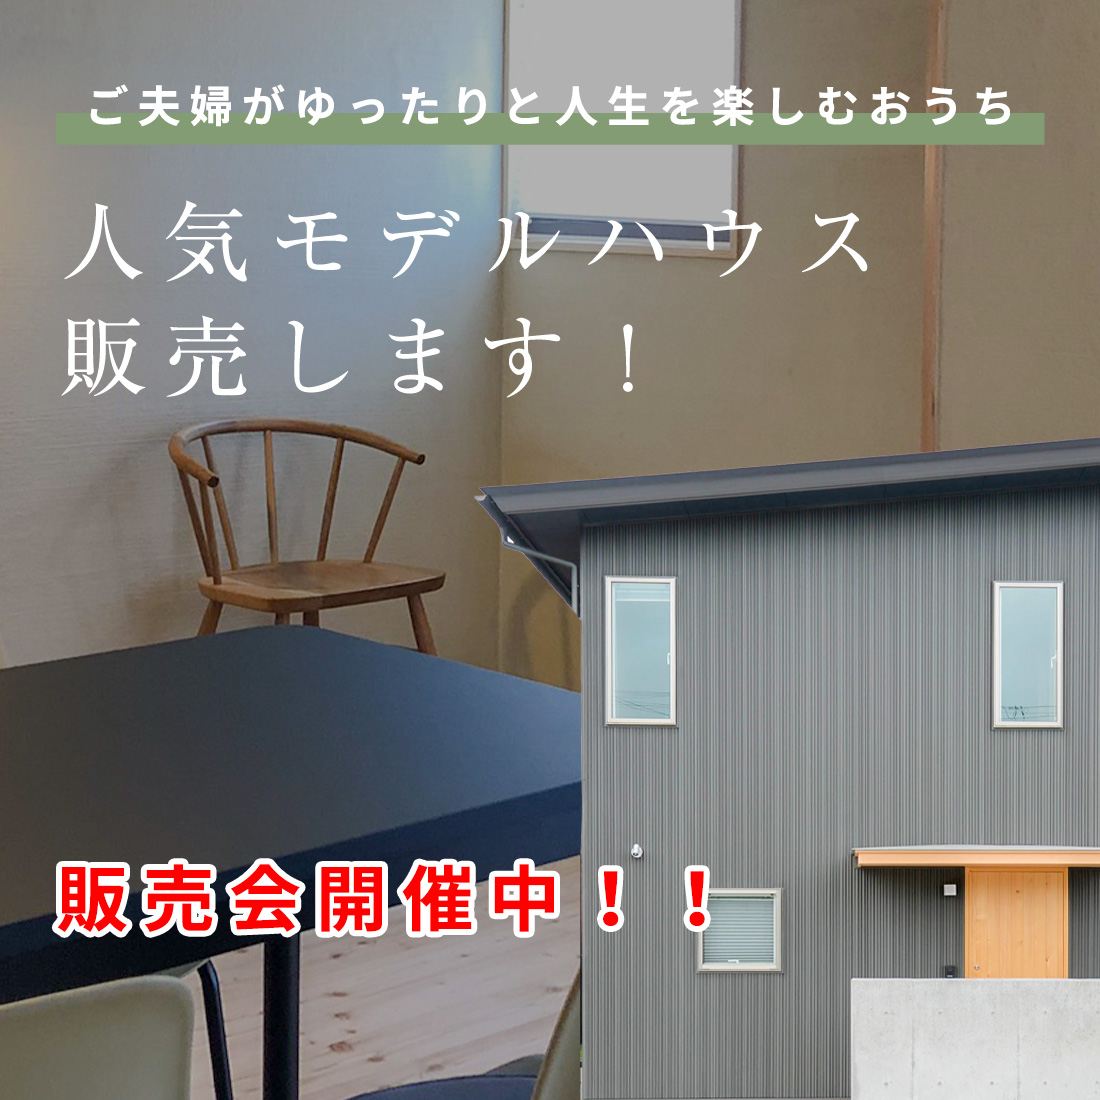 MODEL HOUSE モデルハウス|八戸の新築住宅工務店 グリーンホームズ